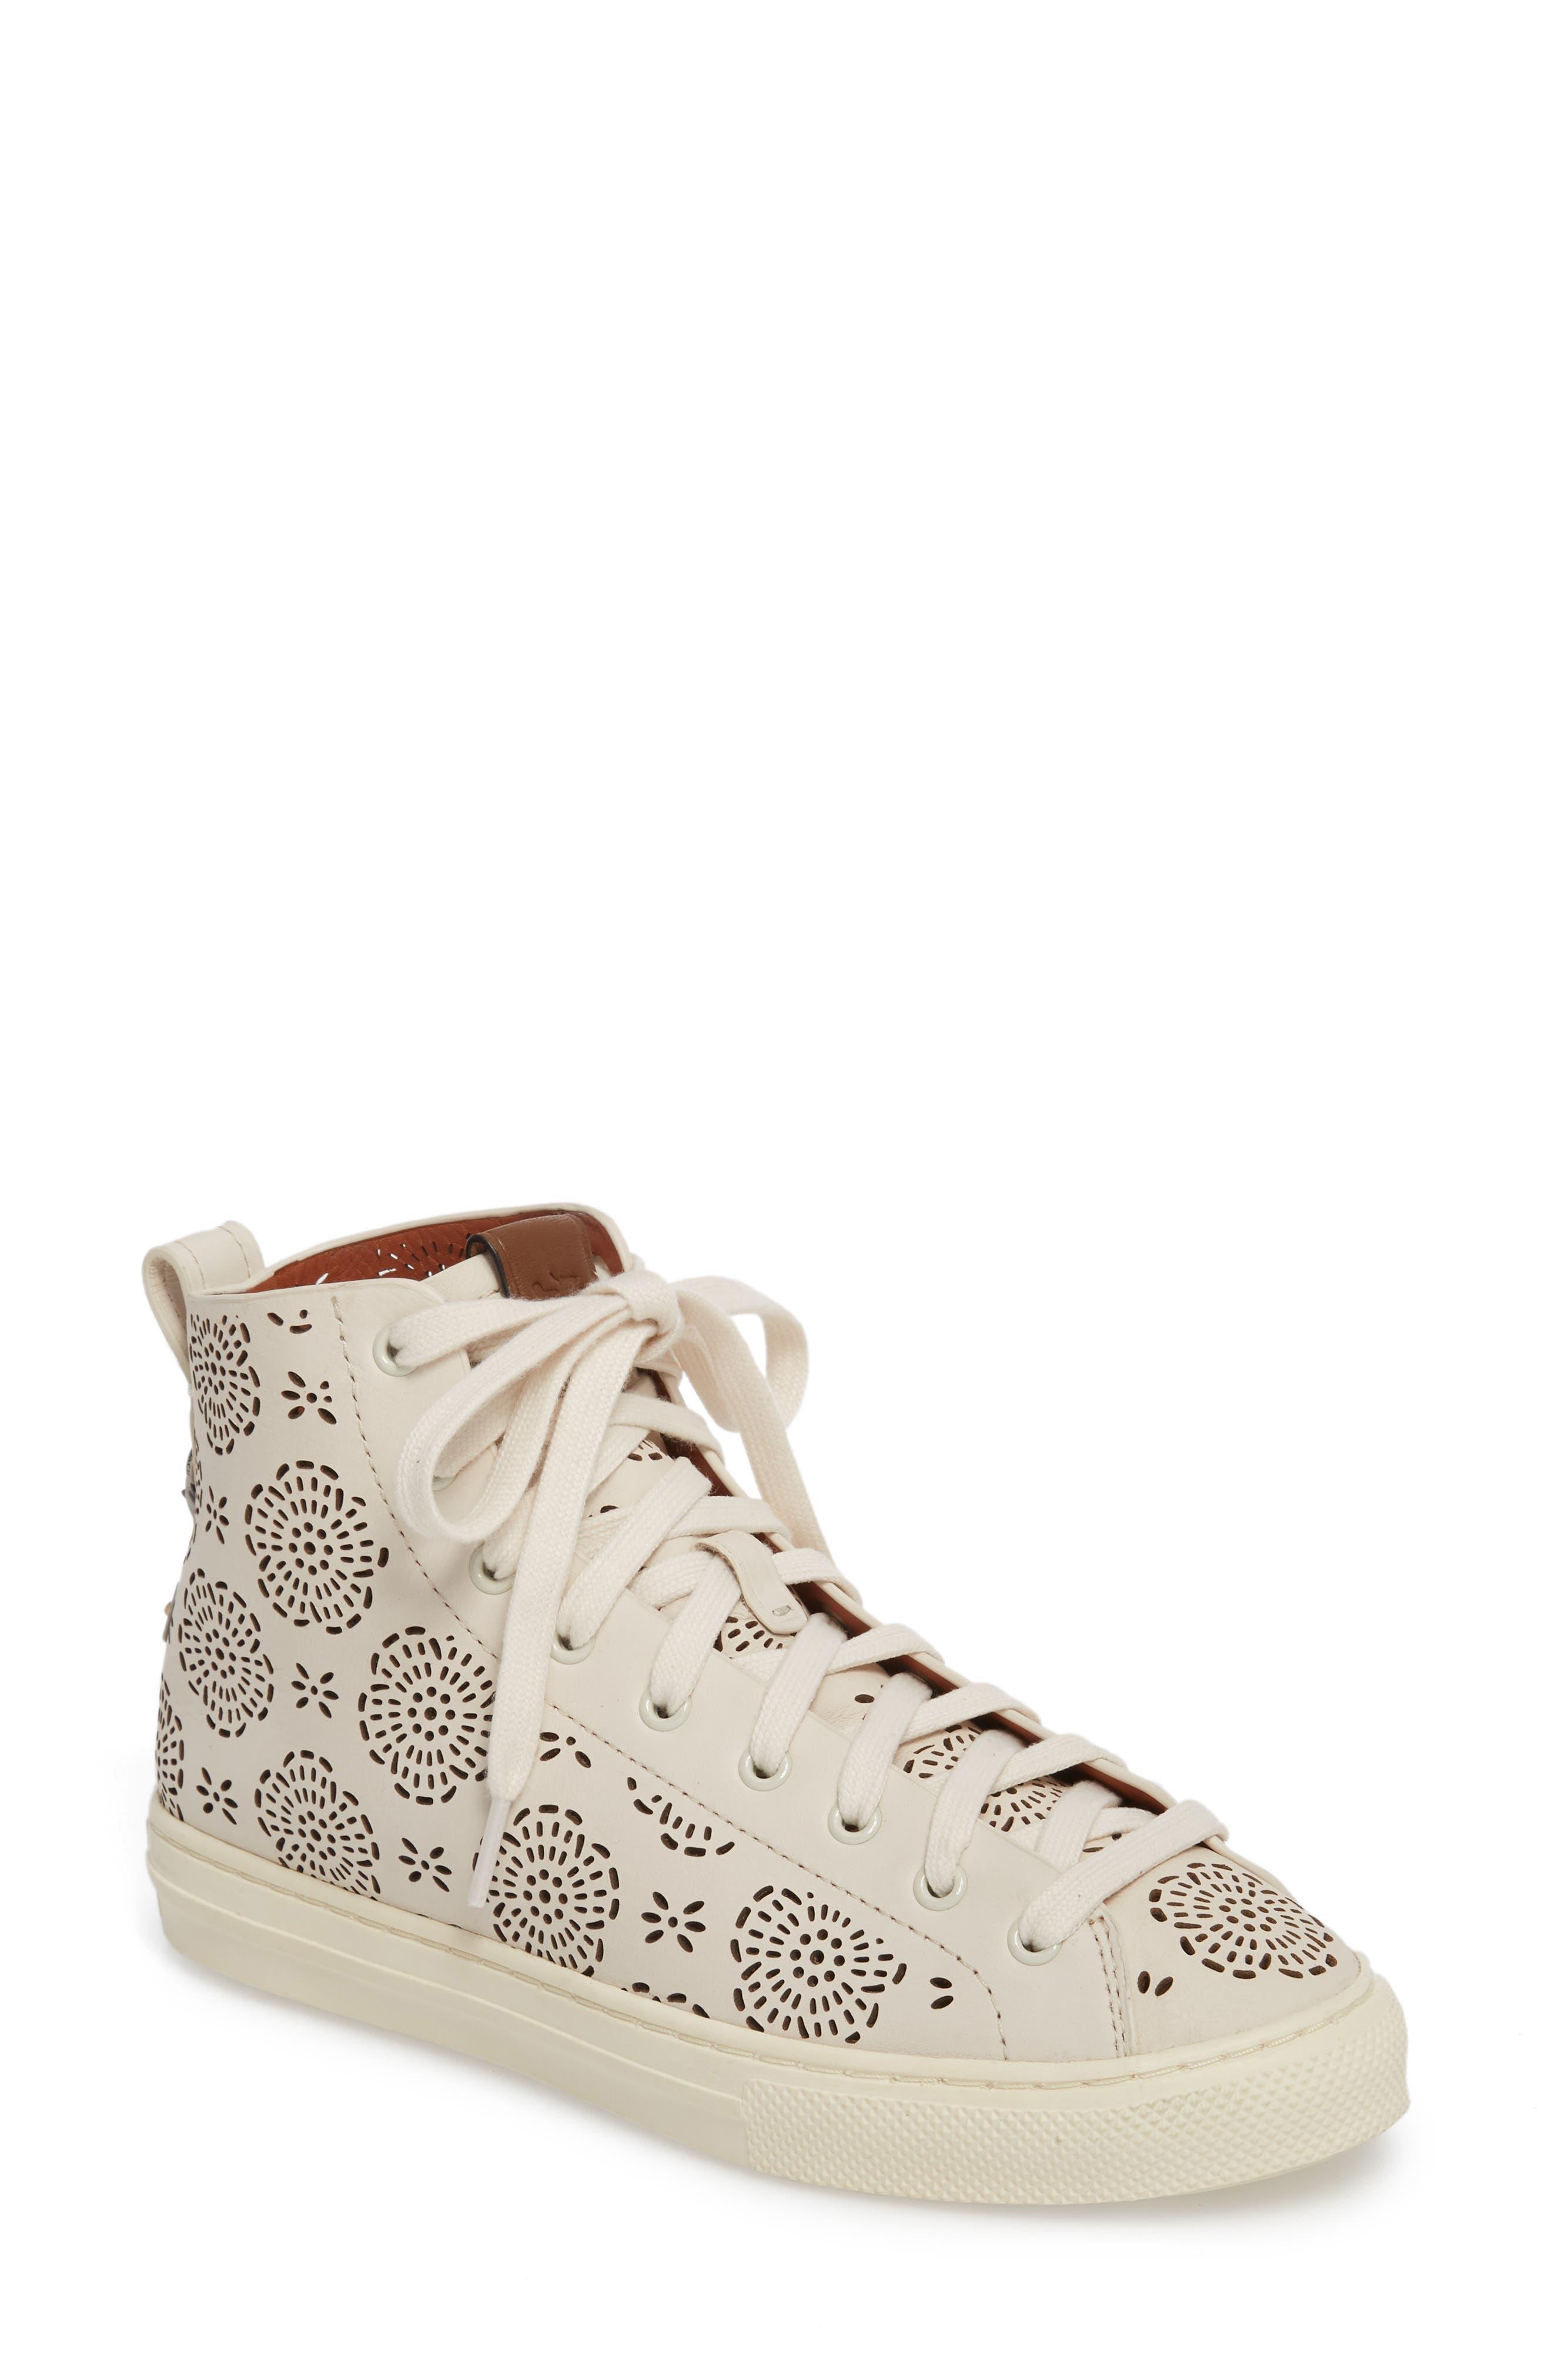 Tea Rose Cutout High Top Sneaker,                         Main,                         color, Chalk Leather